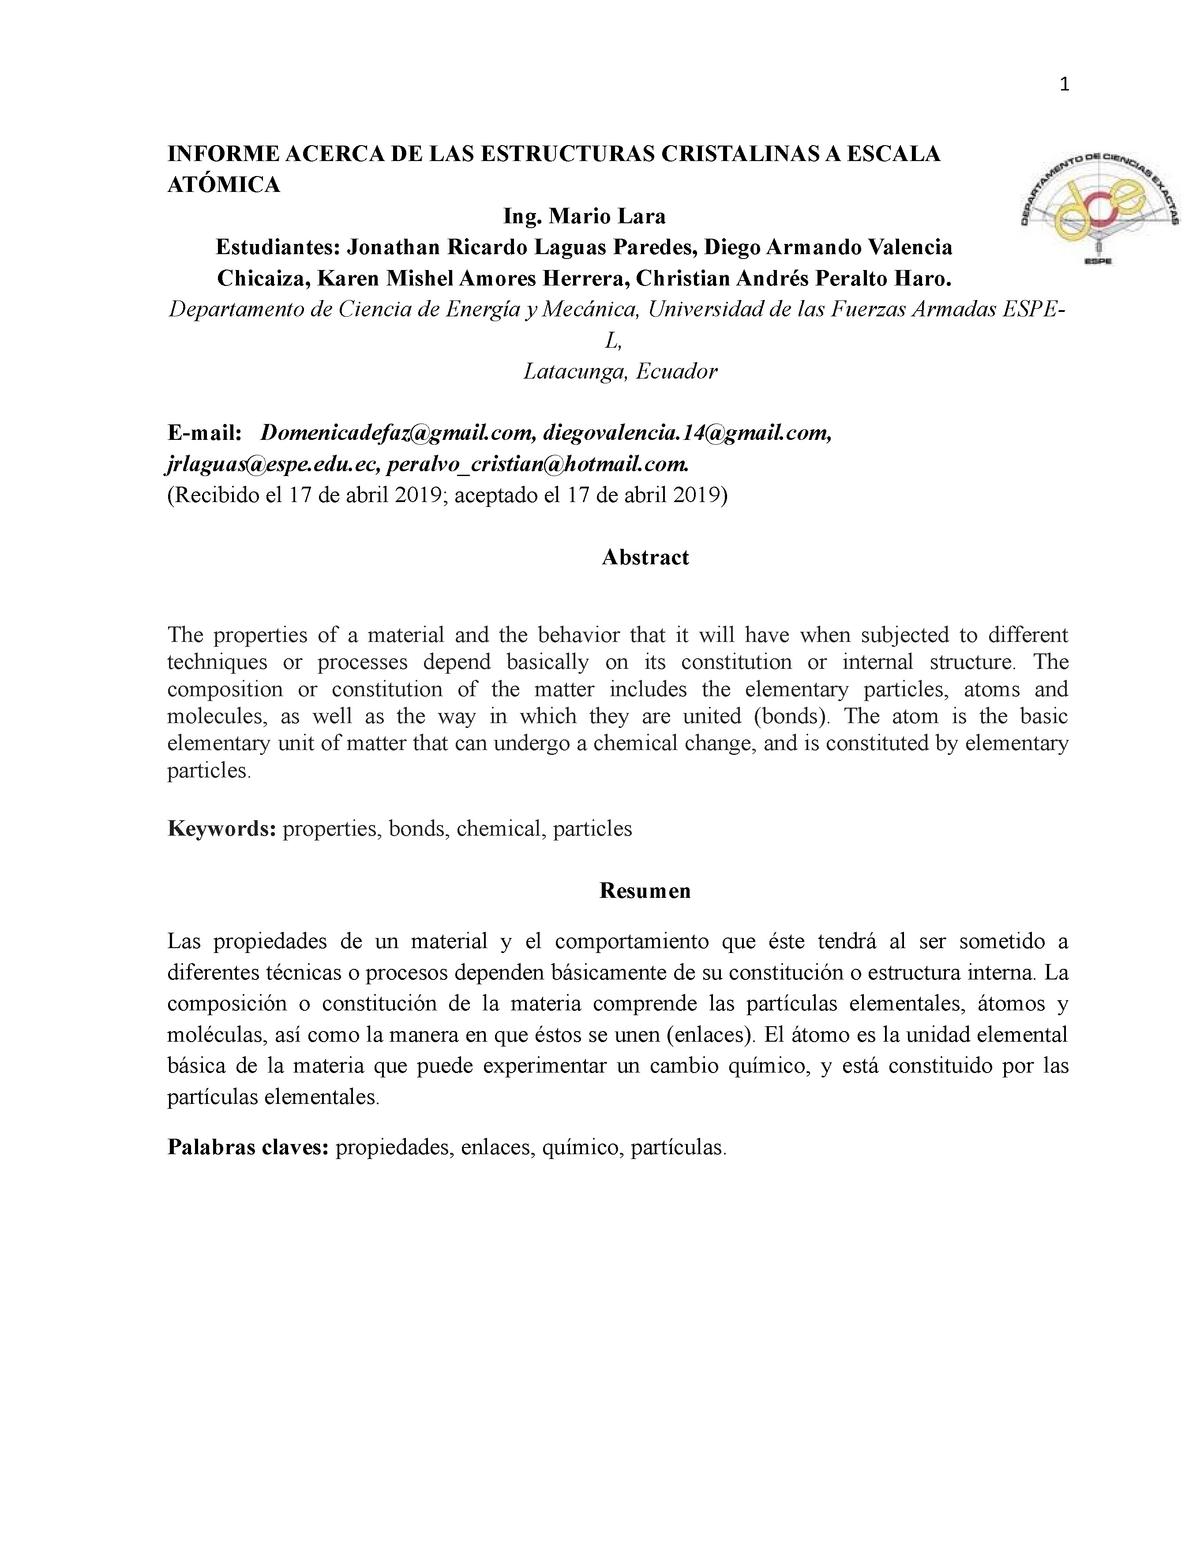 Informe Acerca De Las Estructuras Cristalinas A Escala